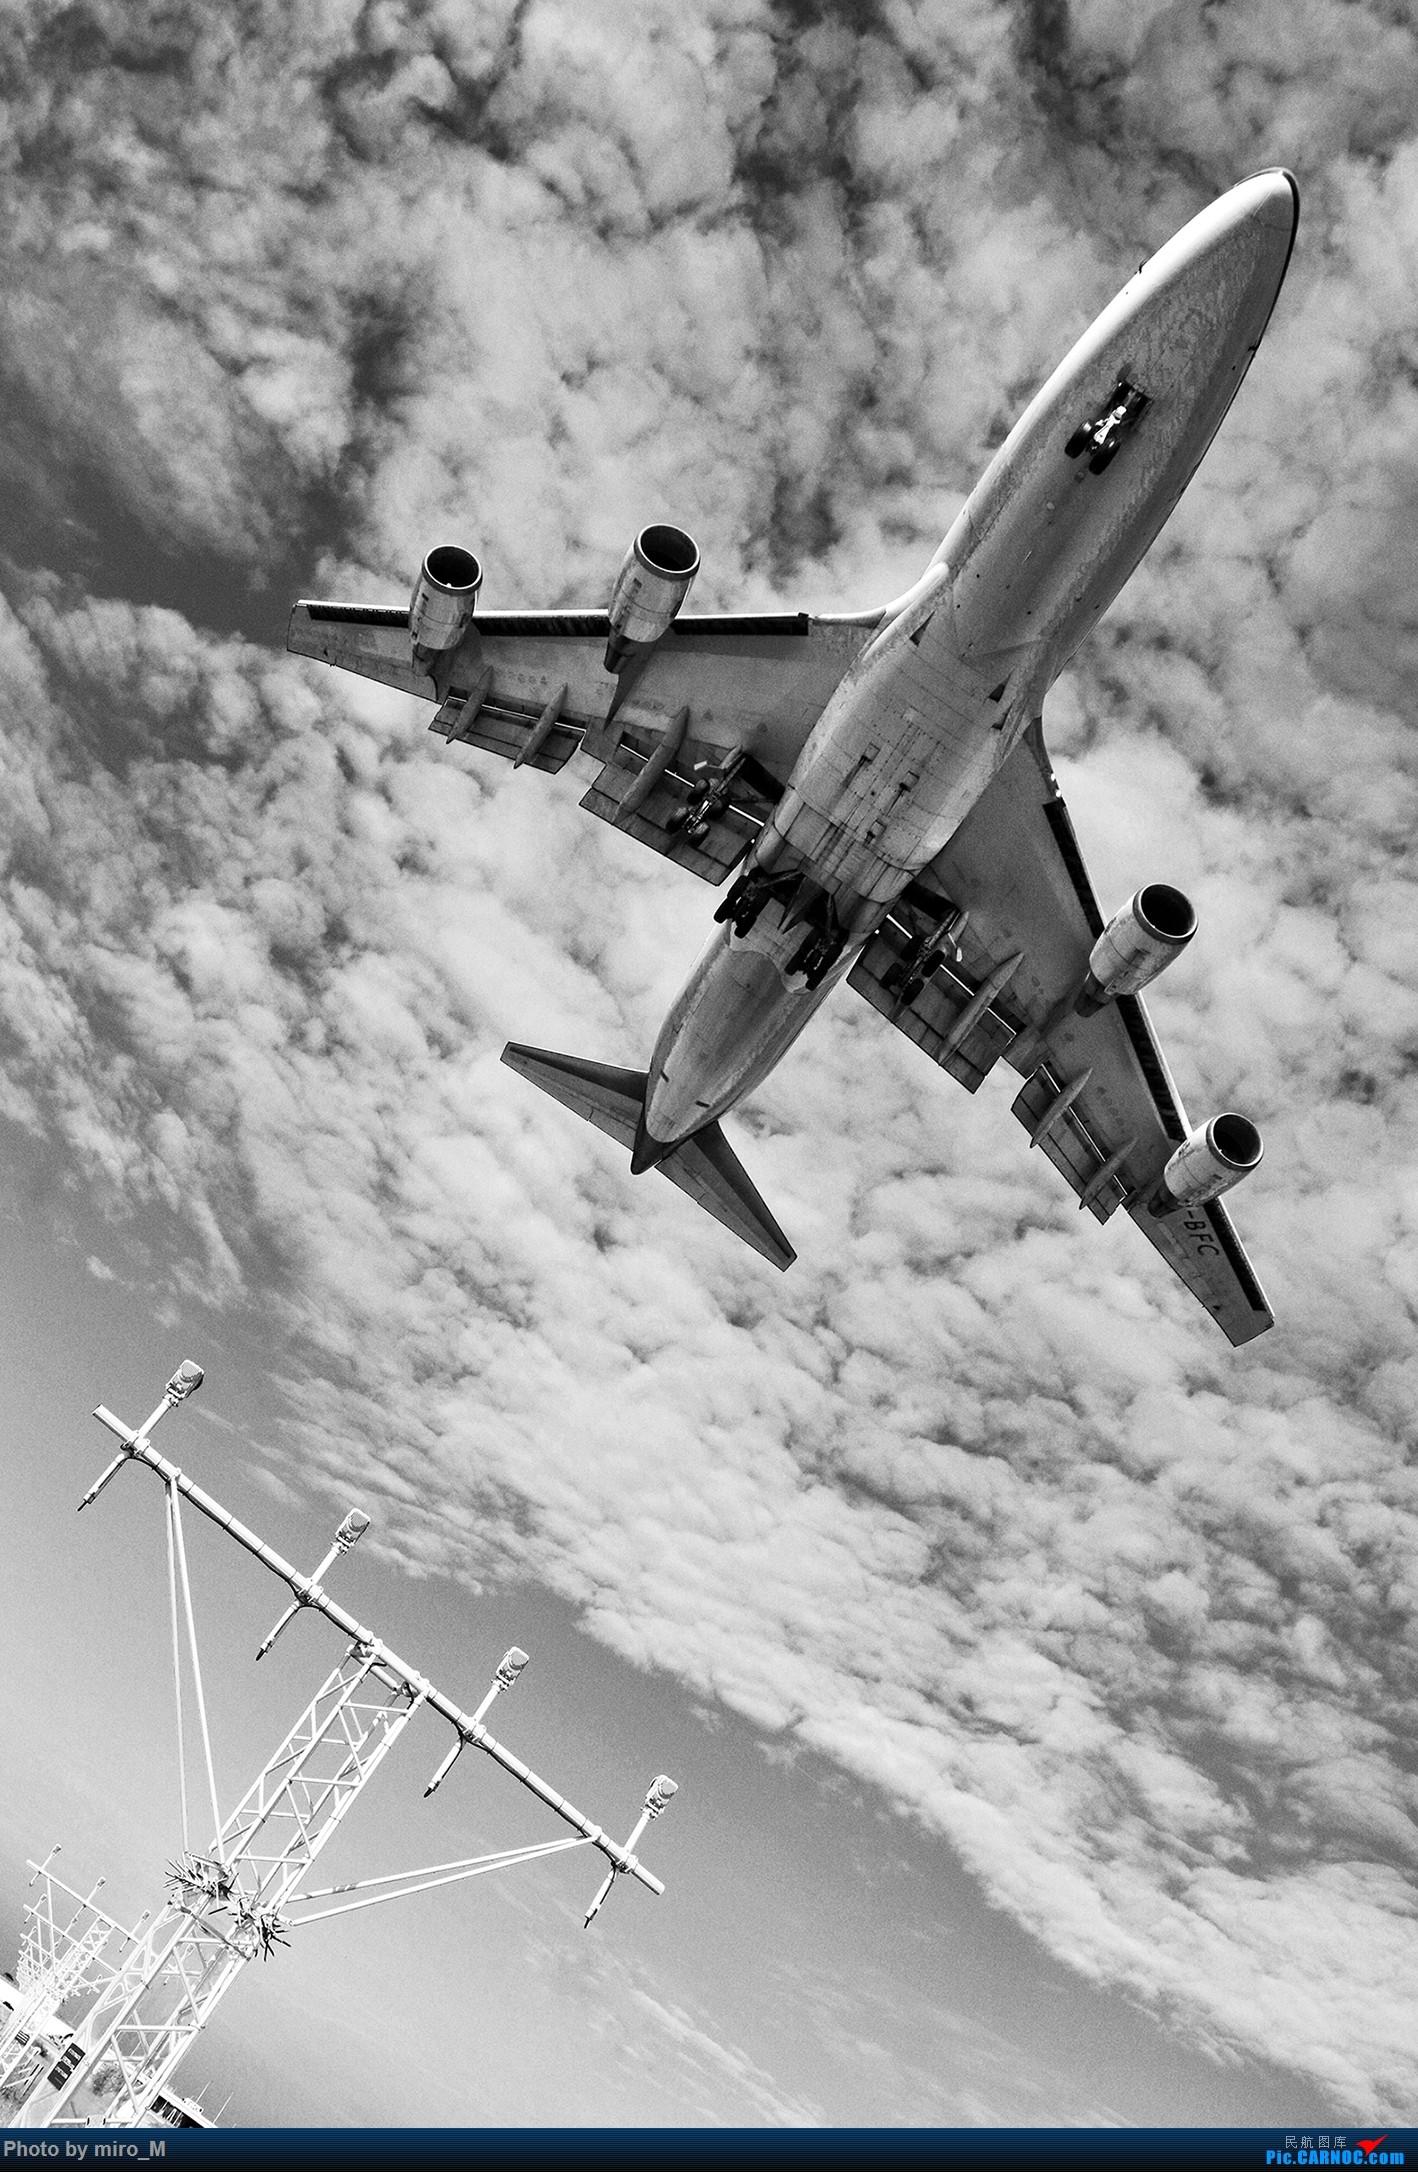 Re:[原创]欧洲小众机型体验之旅,附所到的机场拍机图片(中) BOEING 747-400 PH-BFC AMS